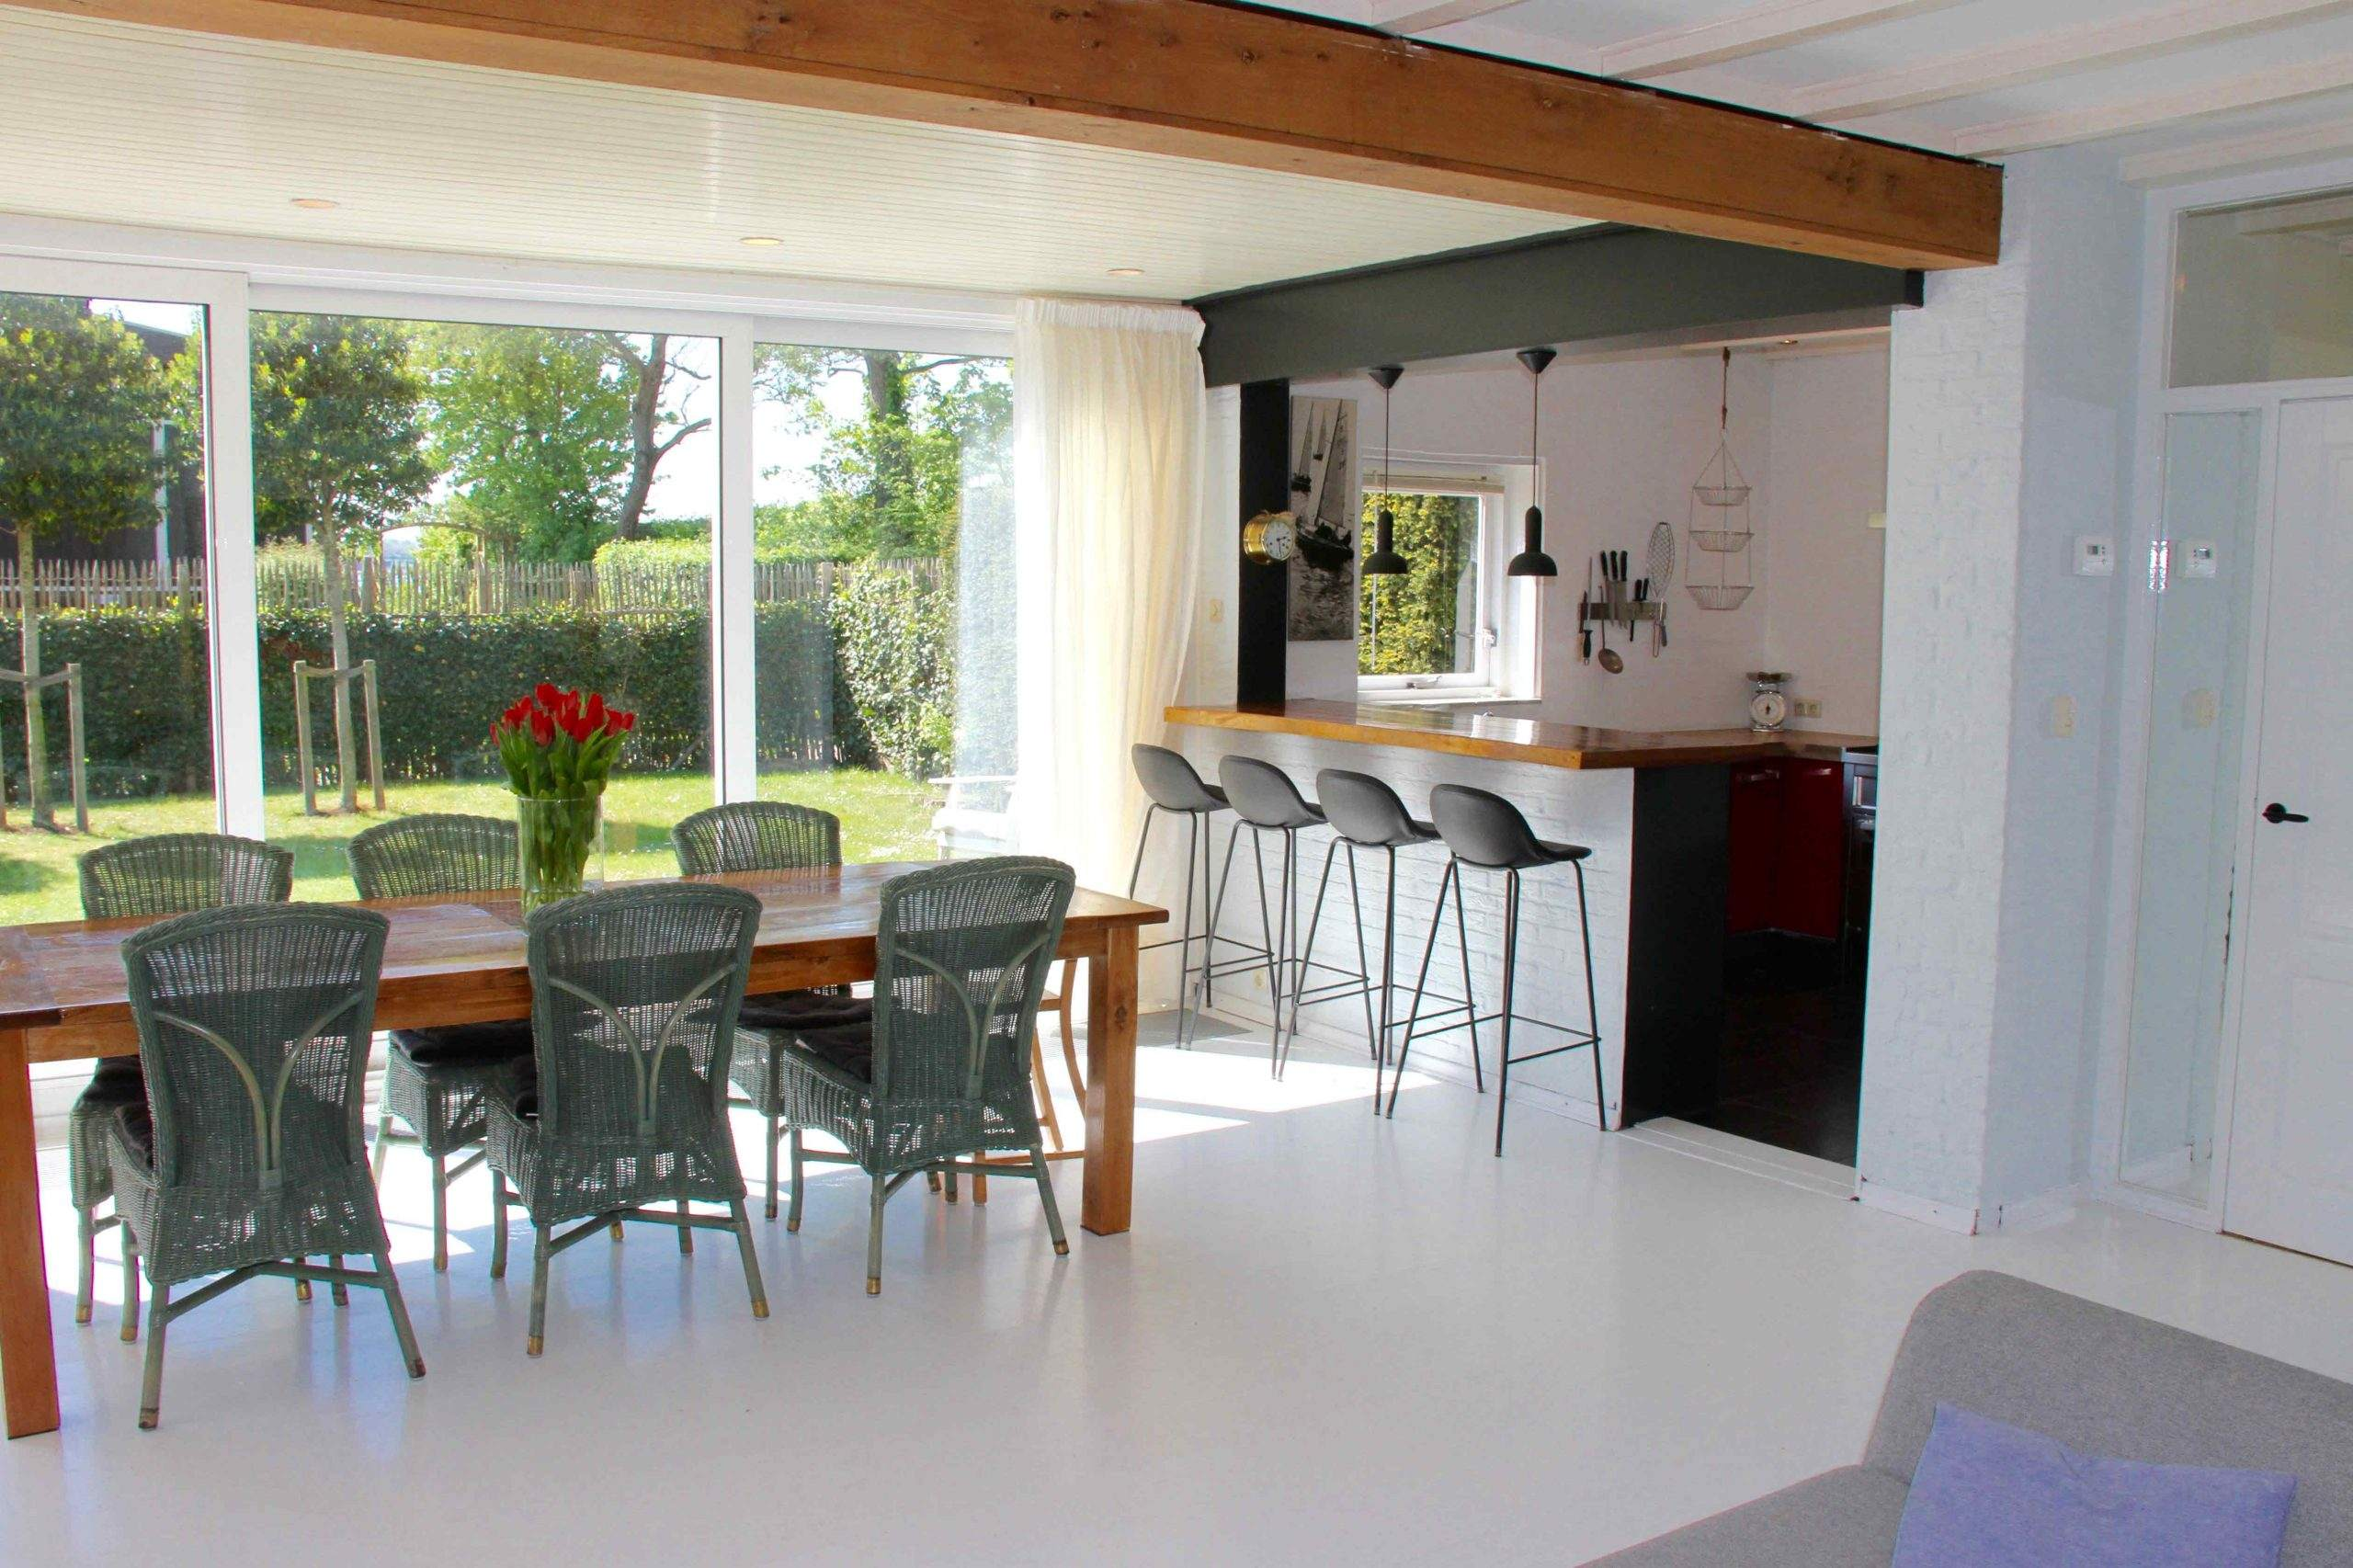 Blie_vakantiehuis-nummer-12-zeeland_keuken